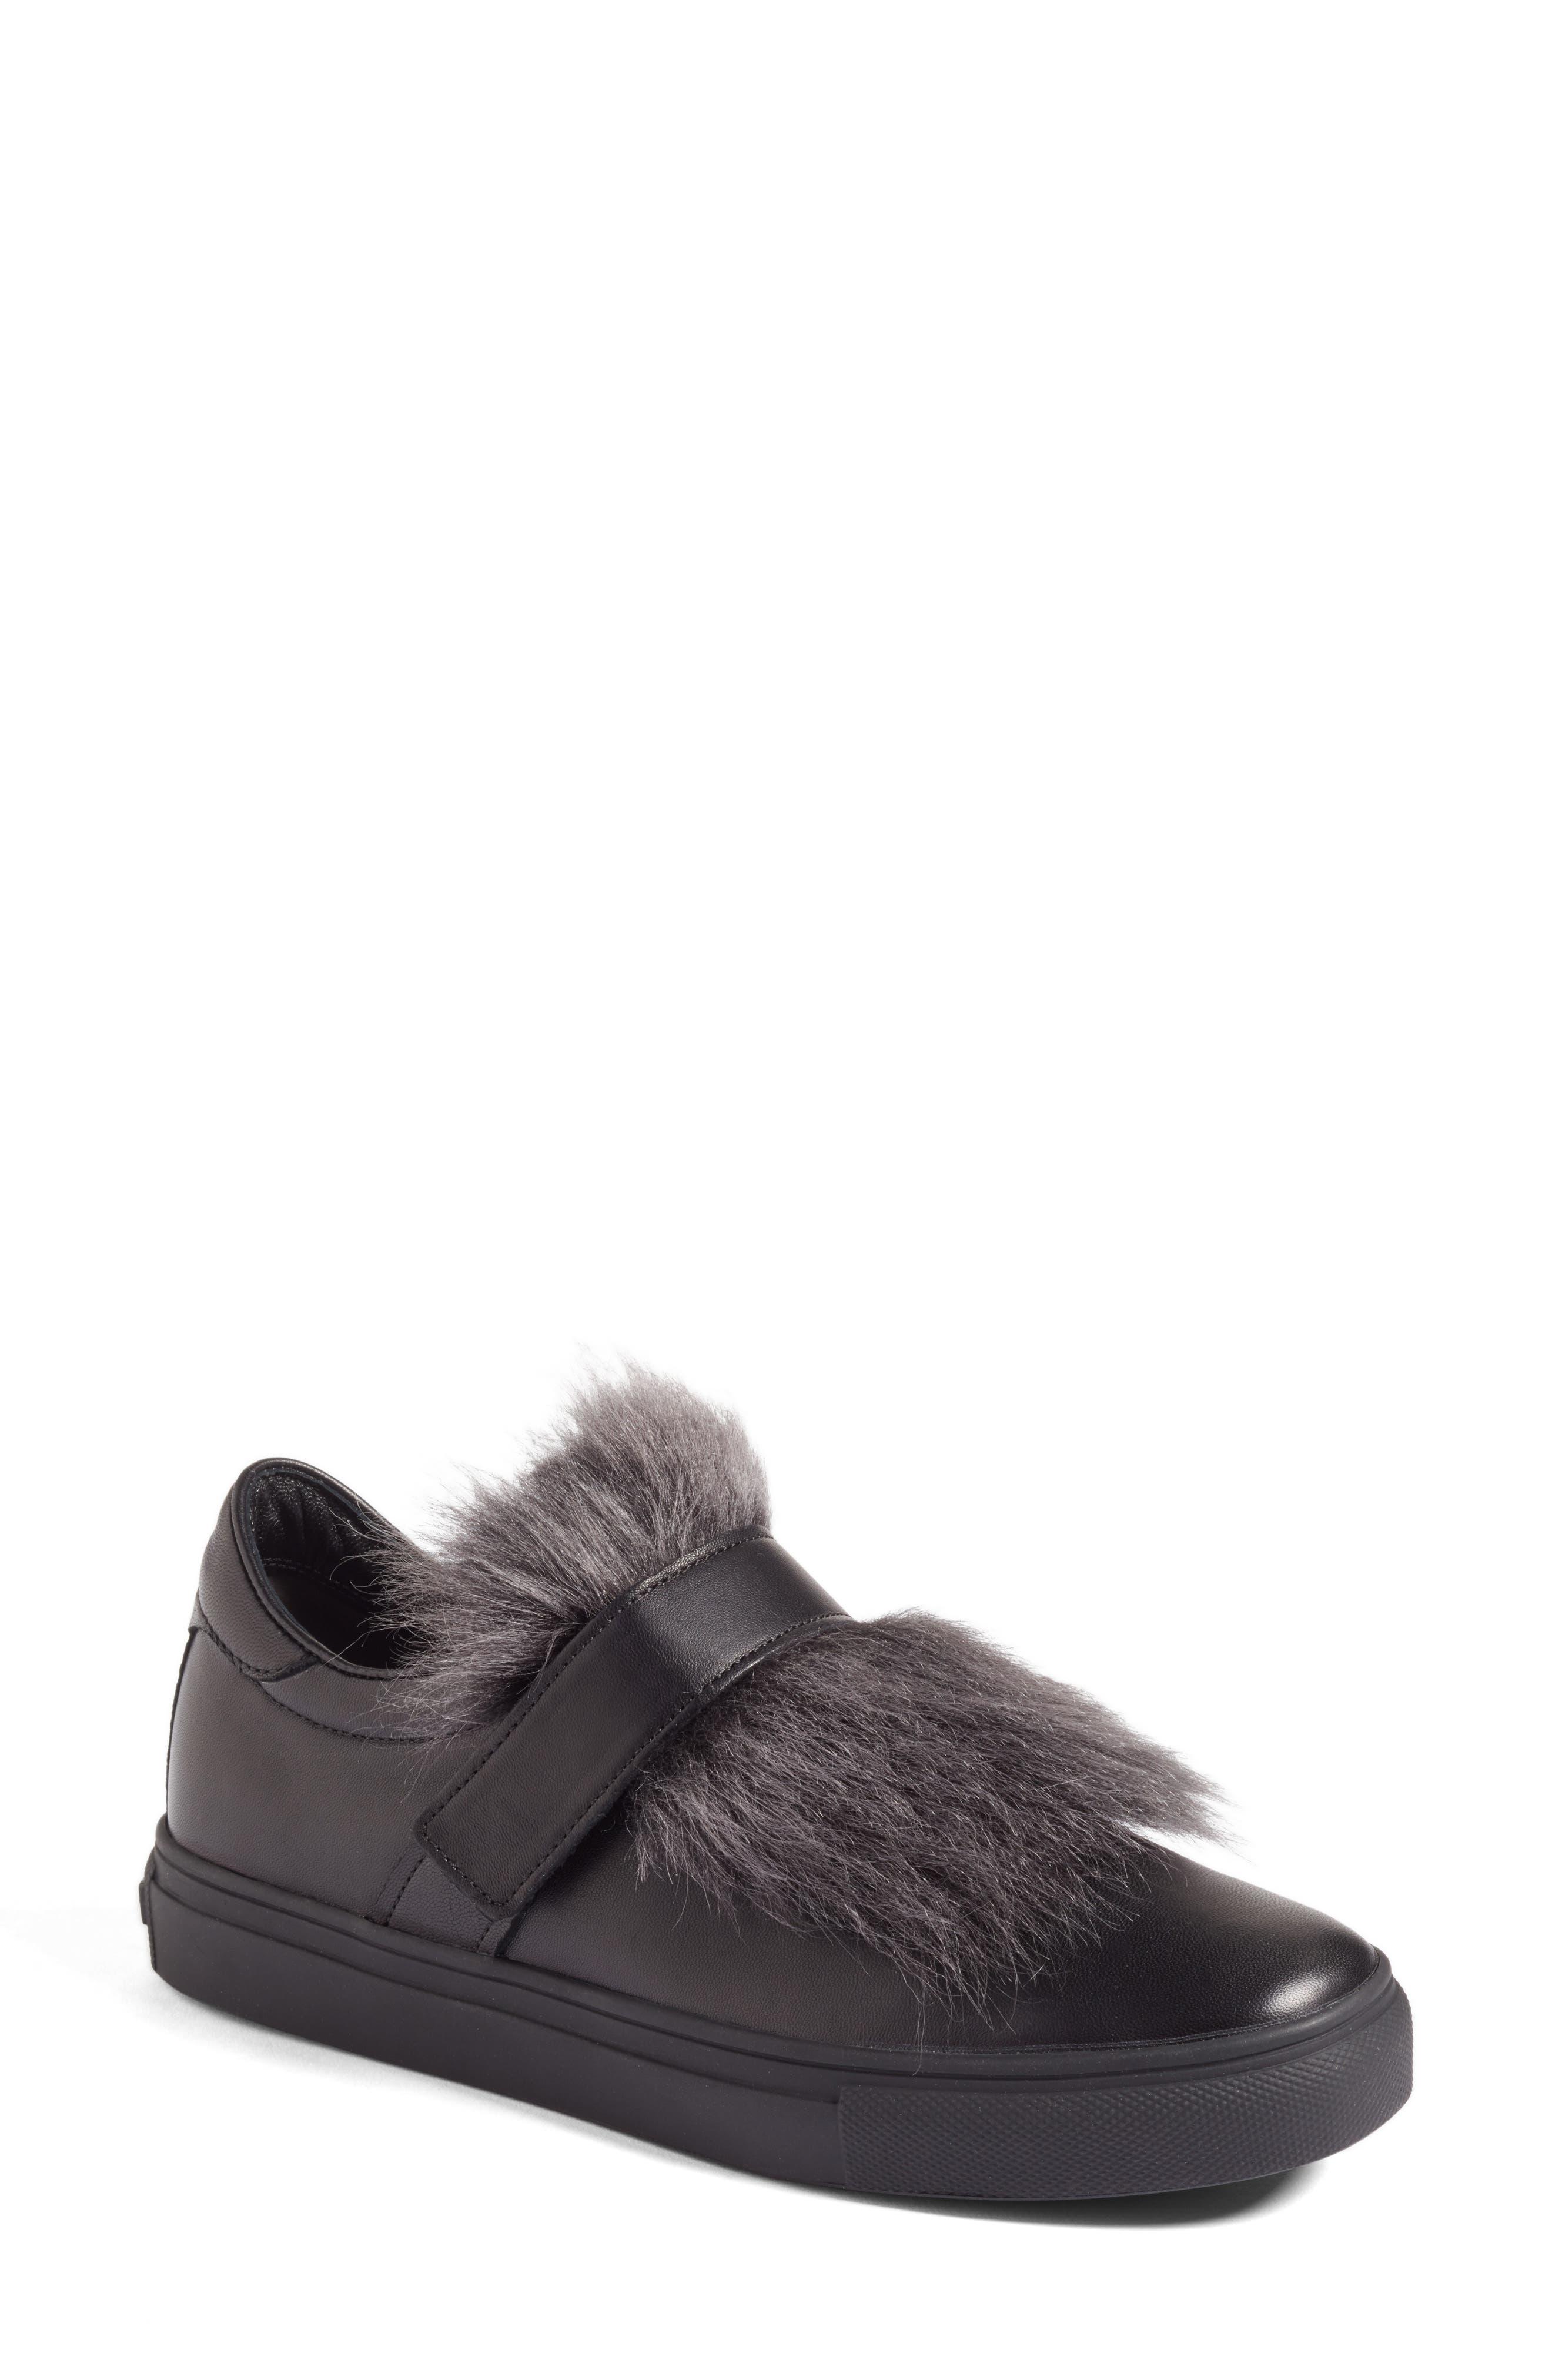 Kennel & Schmenger Basket Slip-On Sneaker with Genuine Shearling Trim,                             Main thumbnail 1, color,                             Black